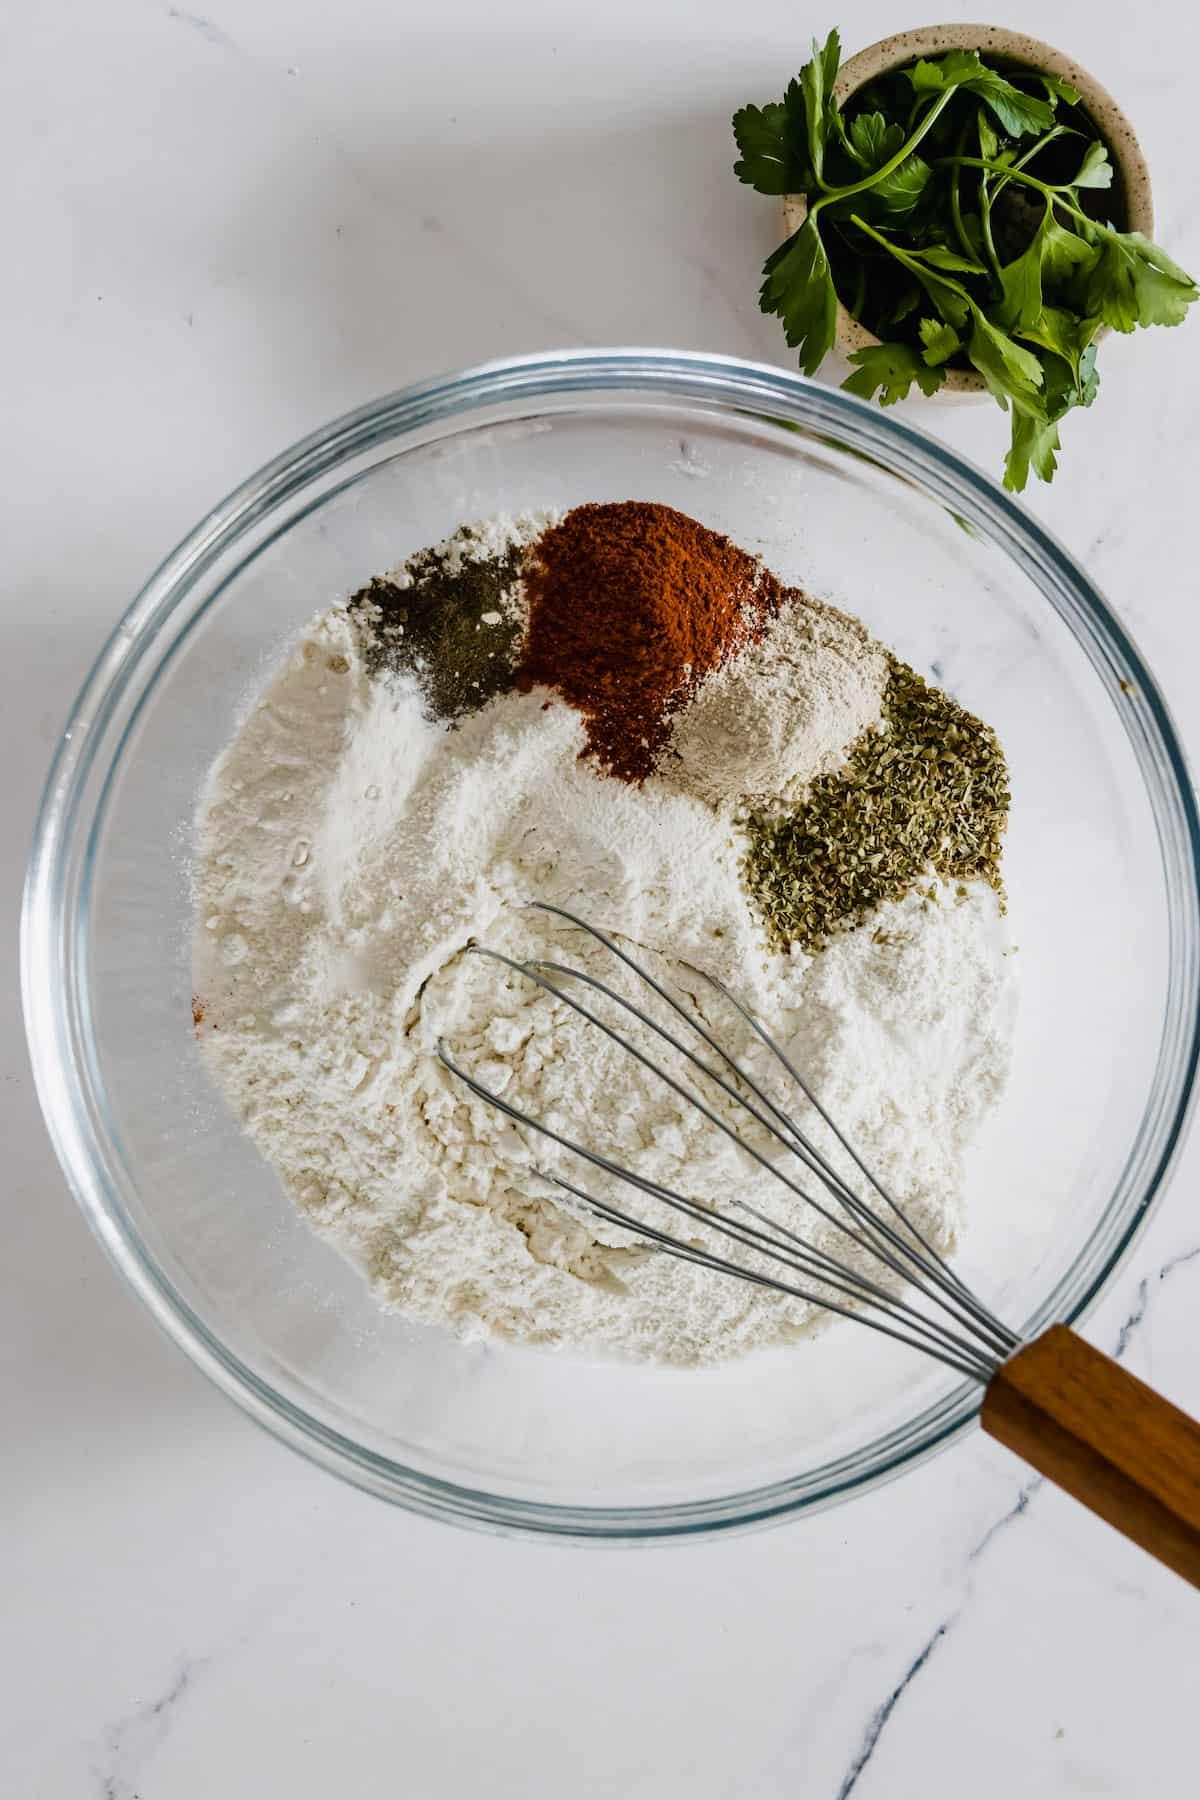 Flour, Salt, Pepper, Paprika, Garlic Powder and Onion Powder in a Glass Mixing Bowl